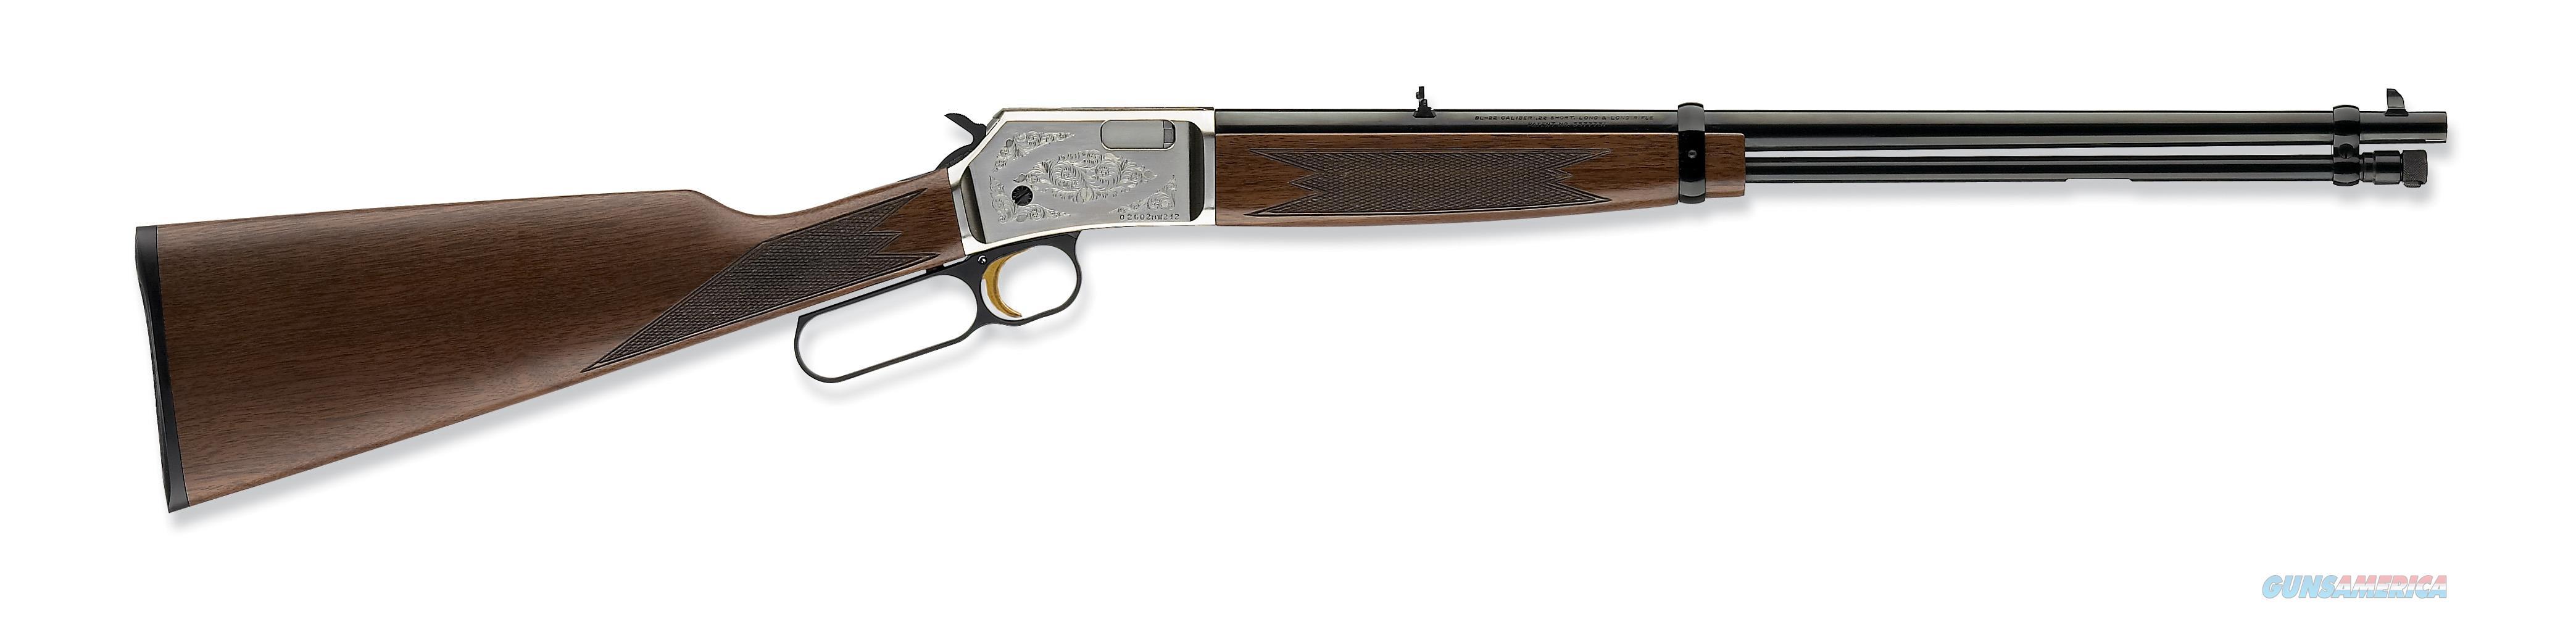 "Browning BL-22 FLD Grade II .22 LR Walnut/Nickel 20"" 024108102   Guns > Rifles > Browning Rifles > Lever Action"